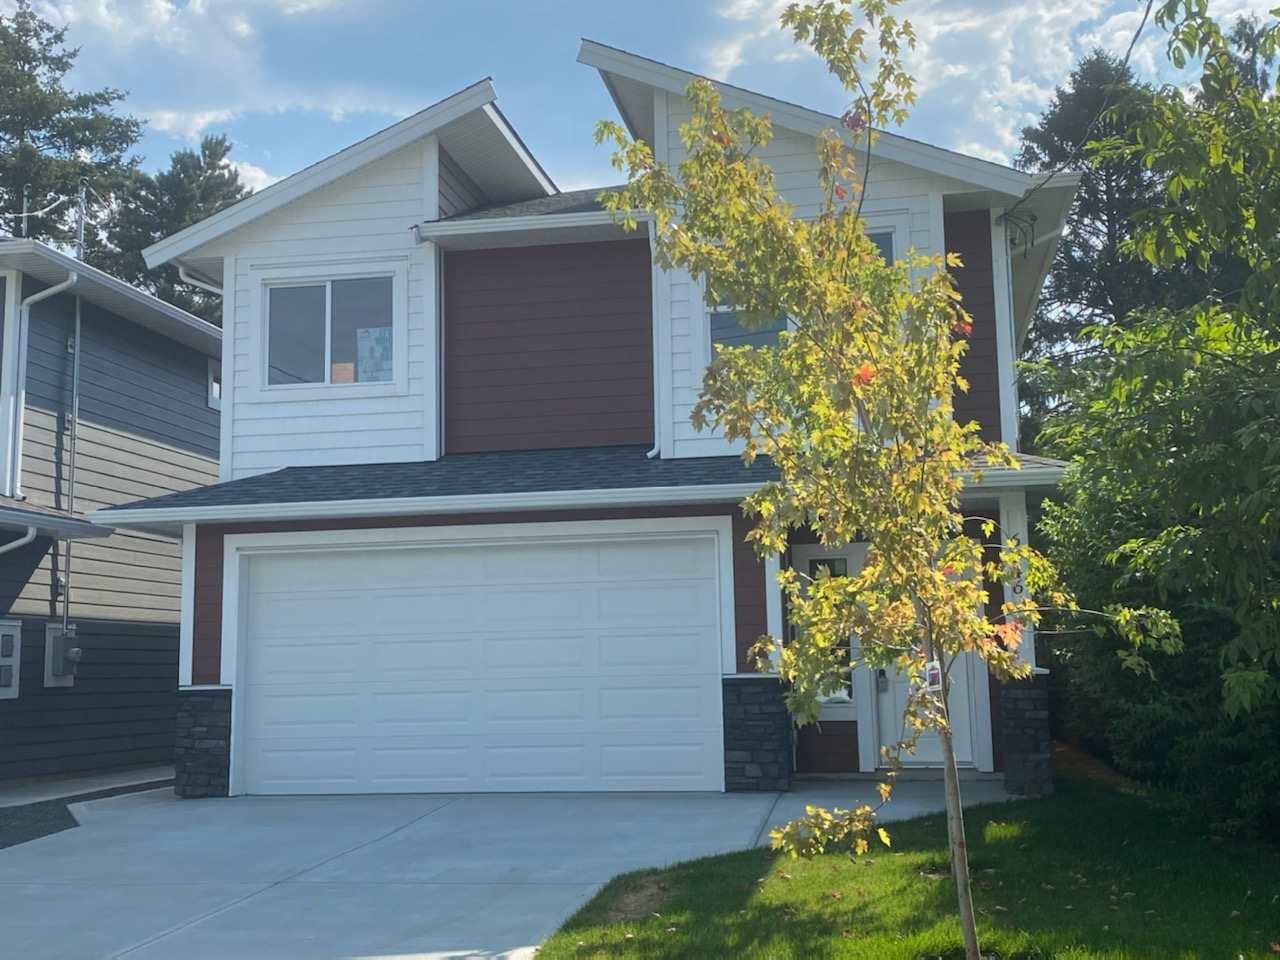 Main Photo: 6346 REID Road in Chilliwack: Sardis West Vedder Rd House for sale (Sardis)  : MLS®# R2449129